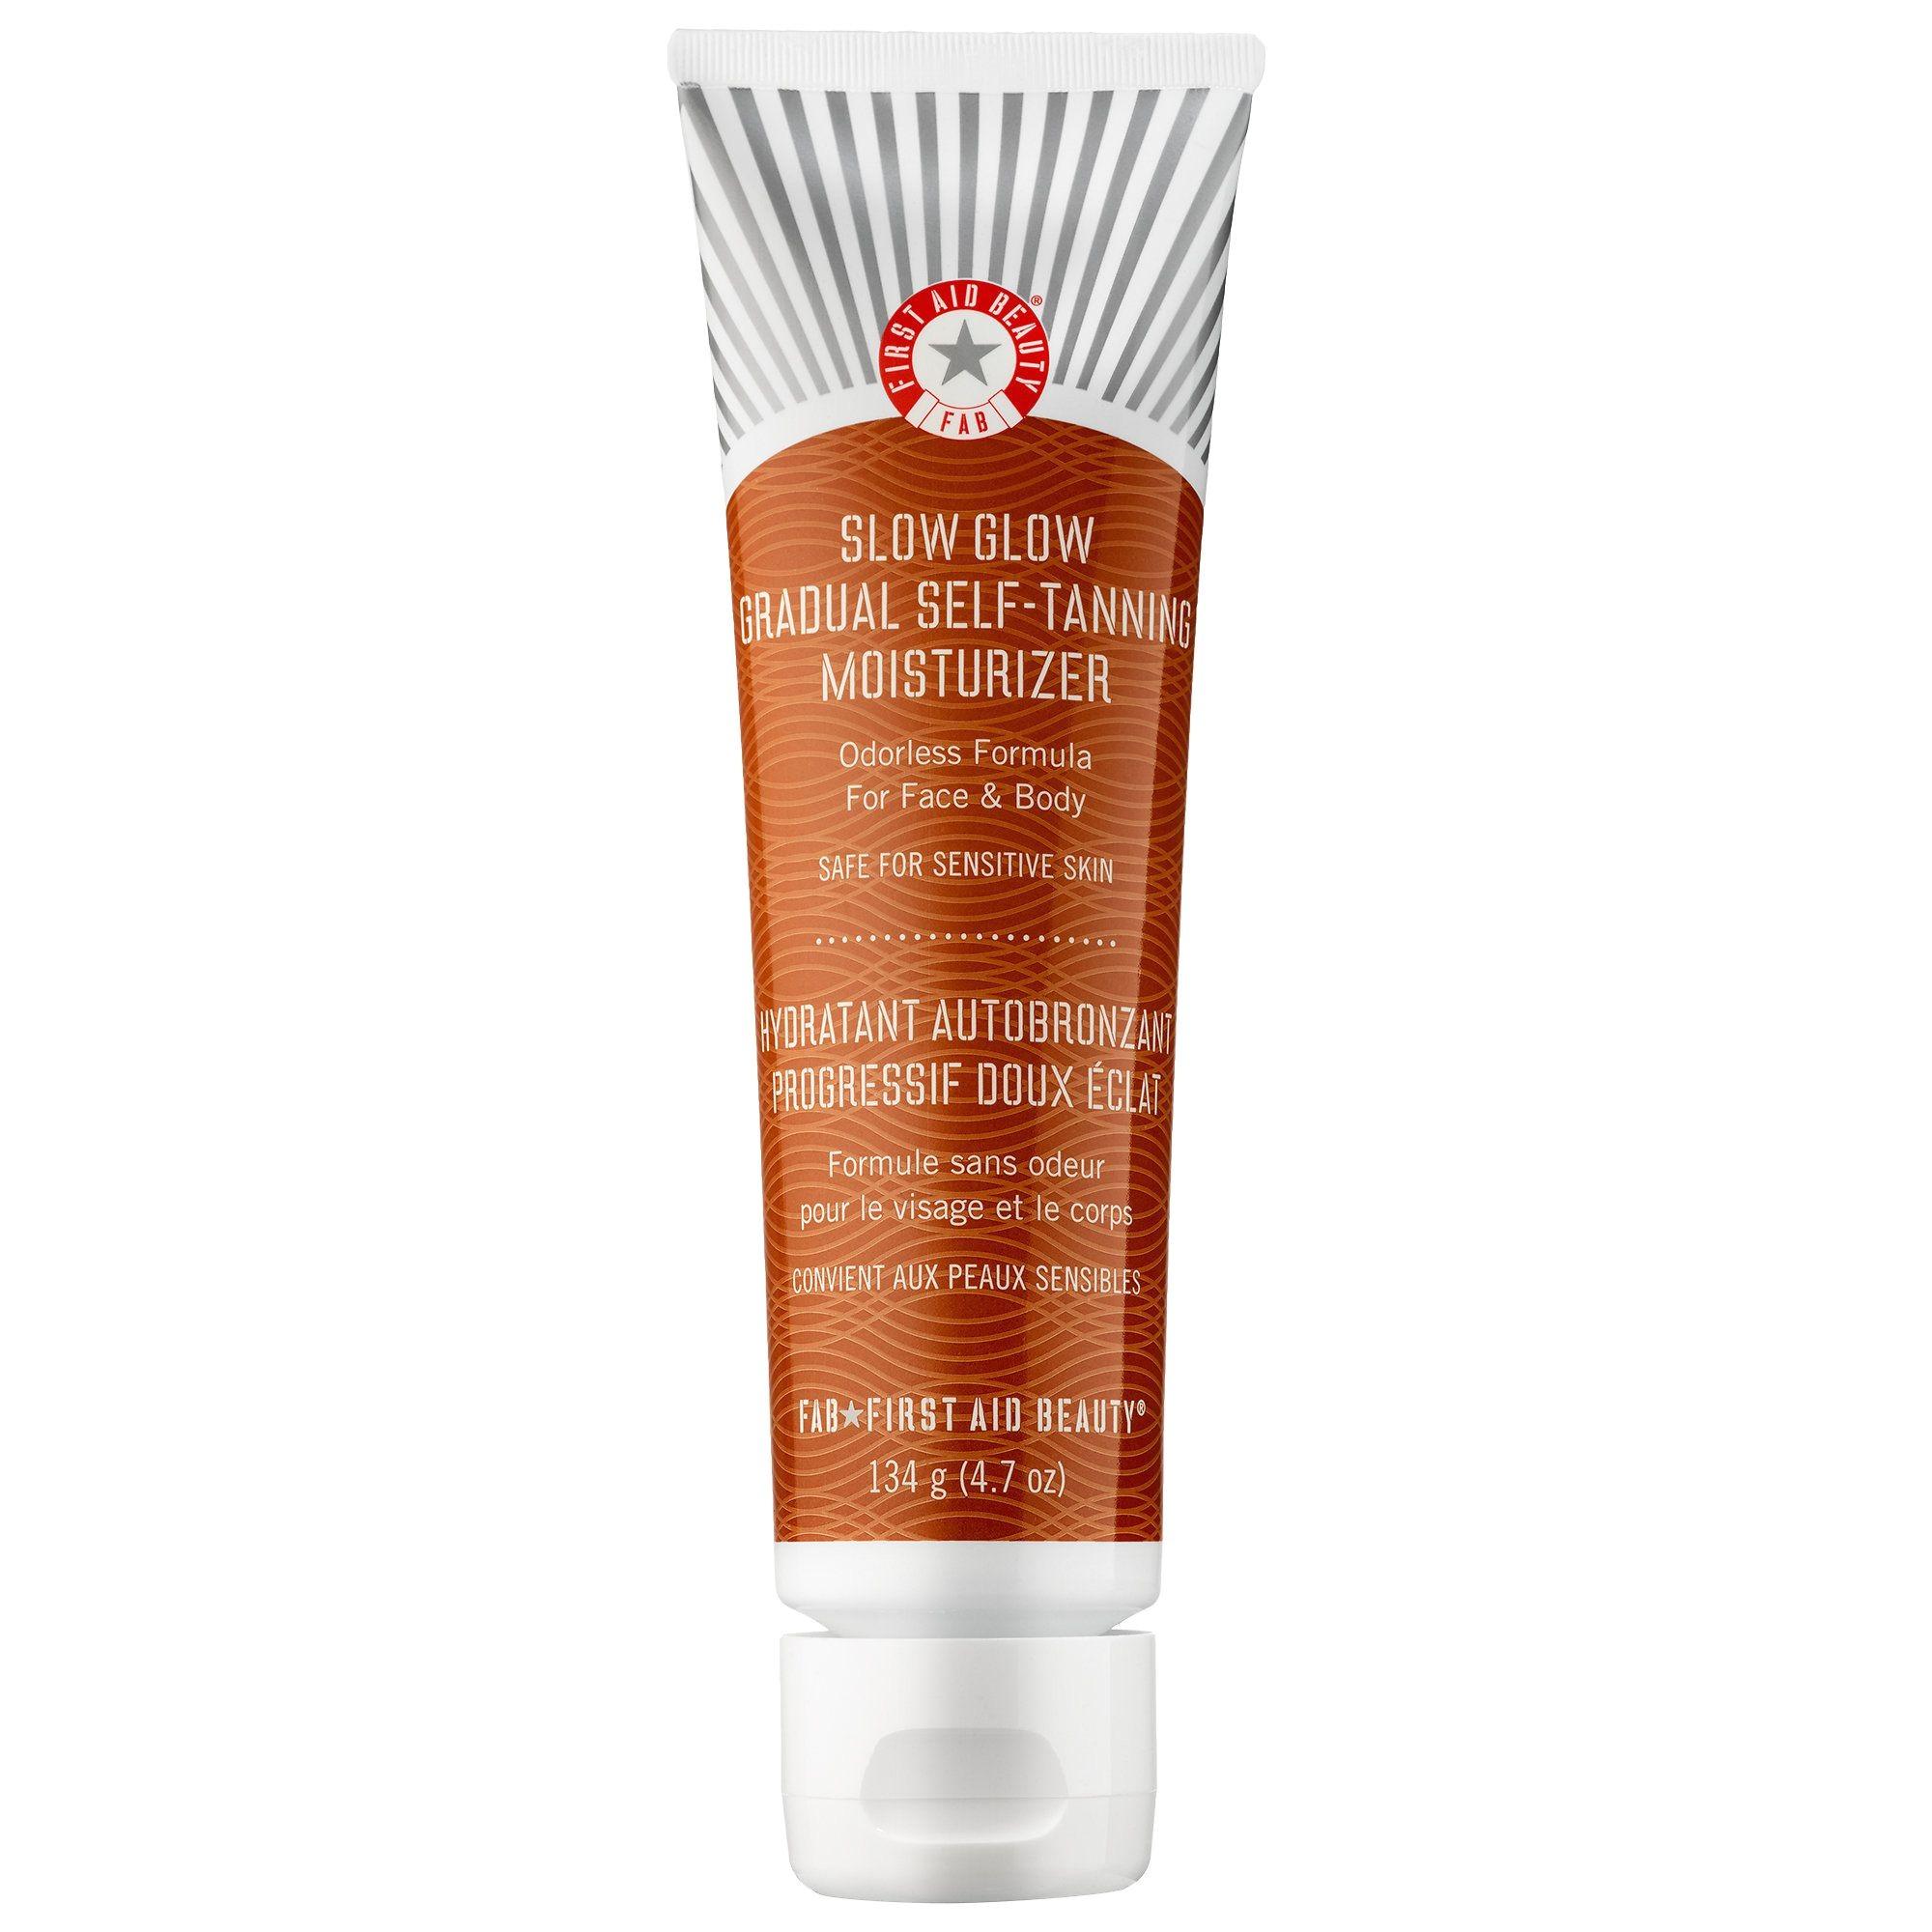 shop first aid beauty s slow glow gradual self tanning moisturizer at sephora the nourishing